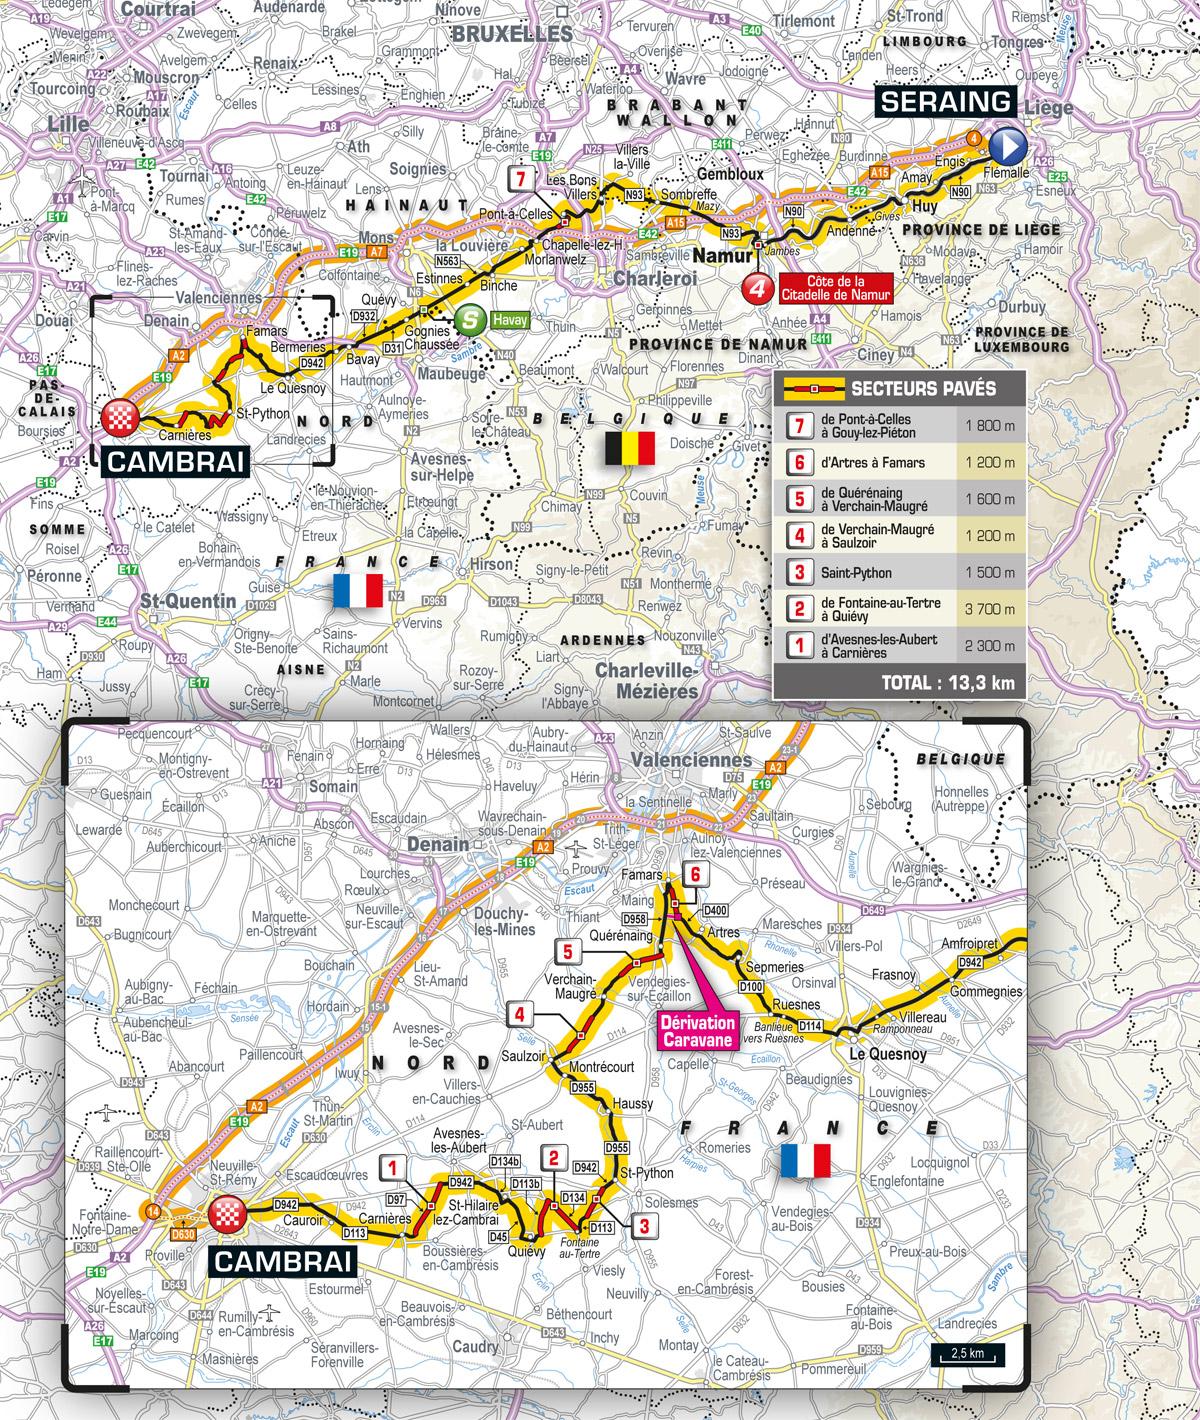 Karte der 4. Etappe der Tour de France 2015